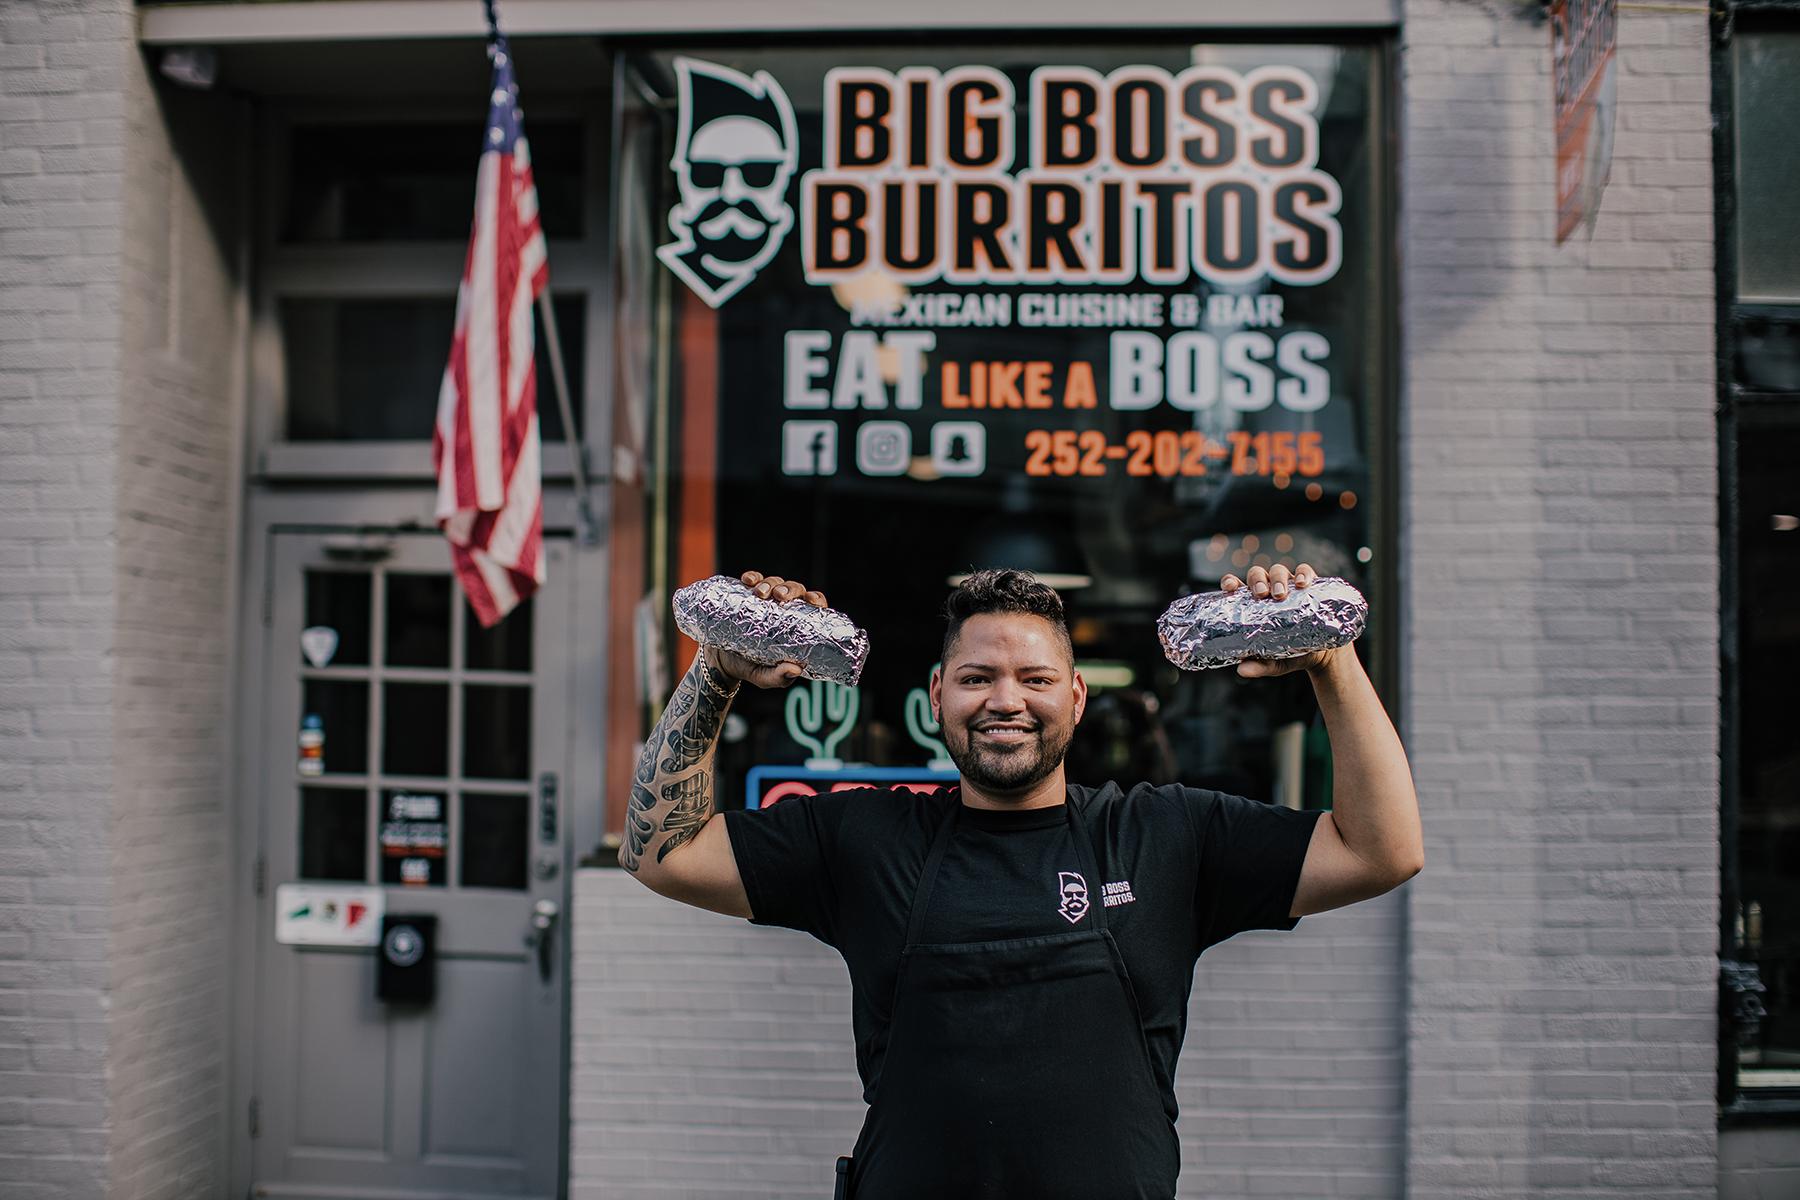 big boss burritos junior gonzales holding two giant burritos outside of restaurant